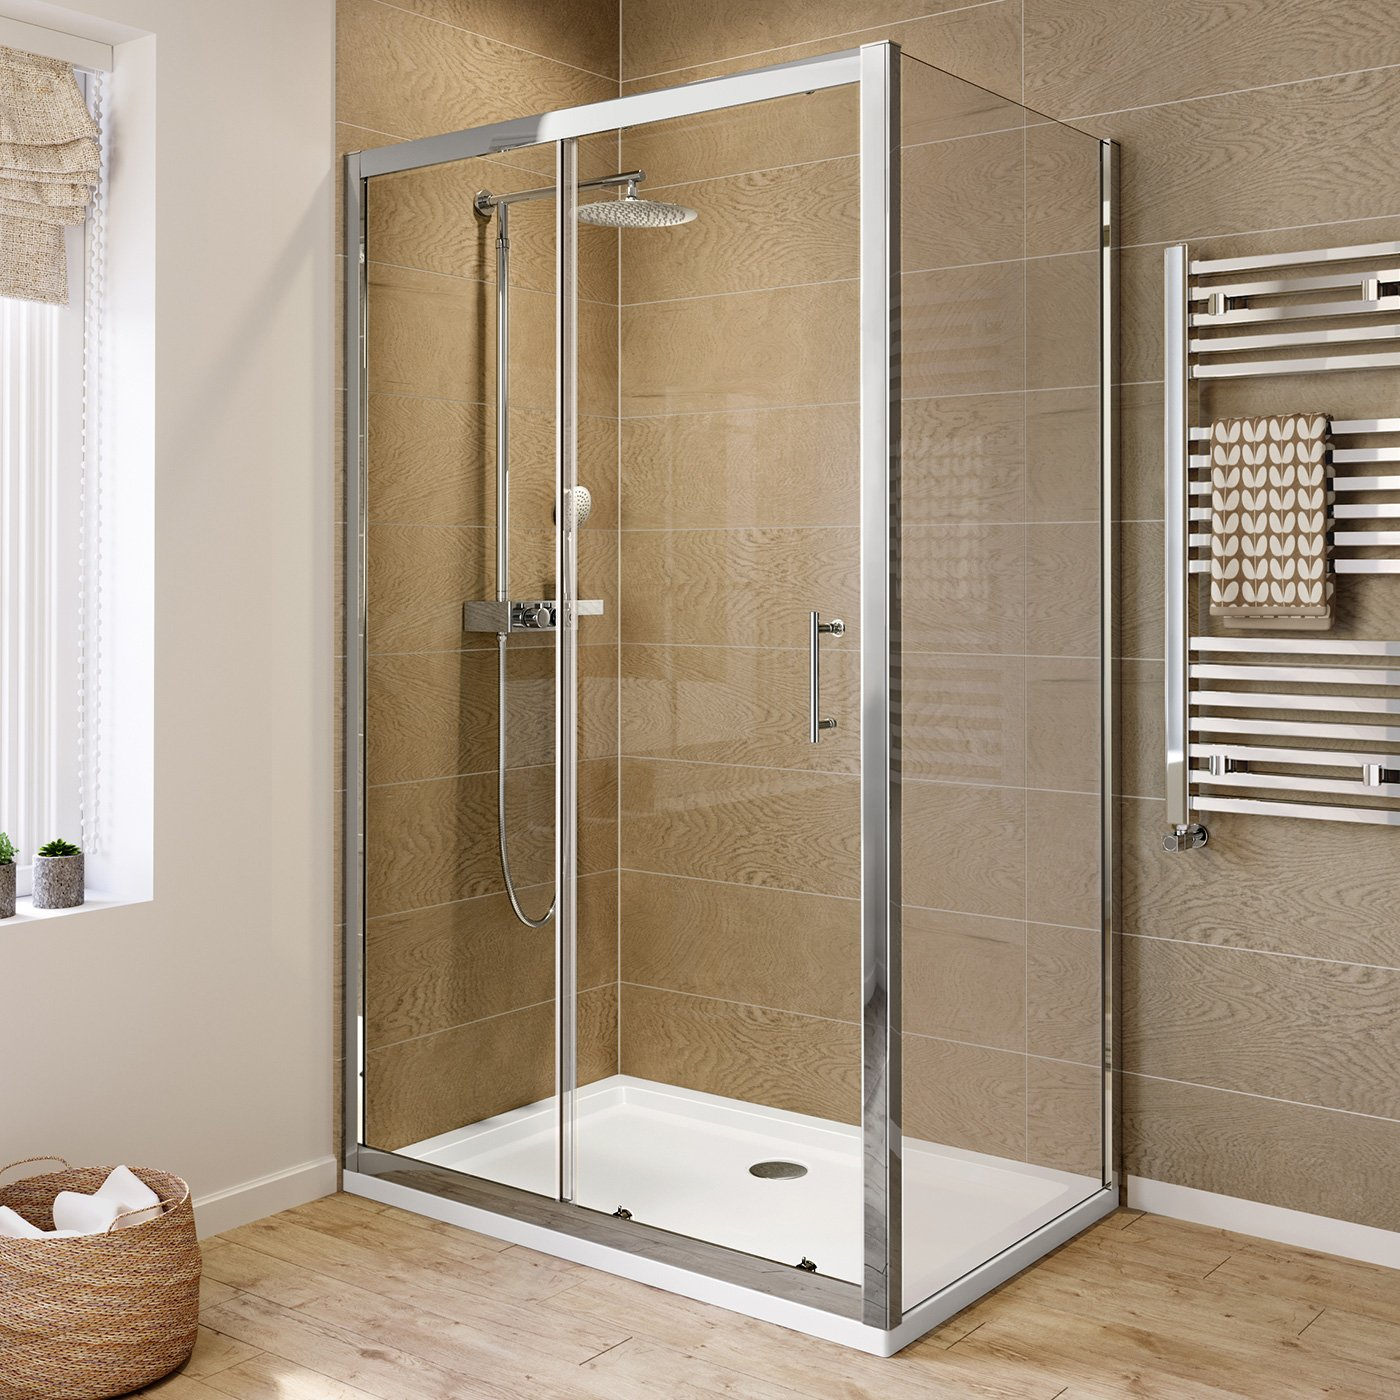 iBathUK 1200 x 760 Modern Sliding 6mm Glass Shower Enclosure Cubicle ...